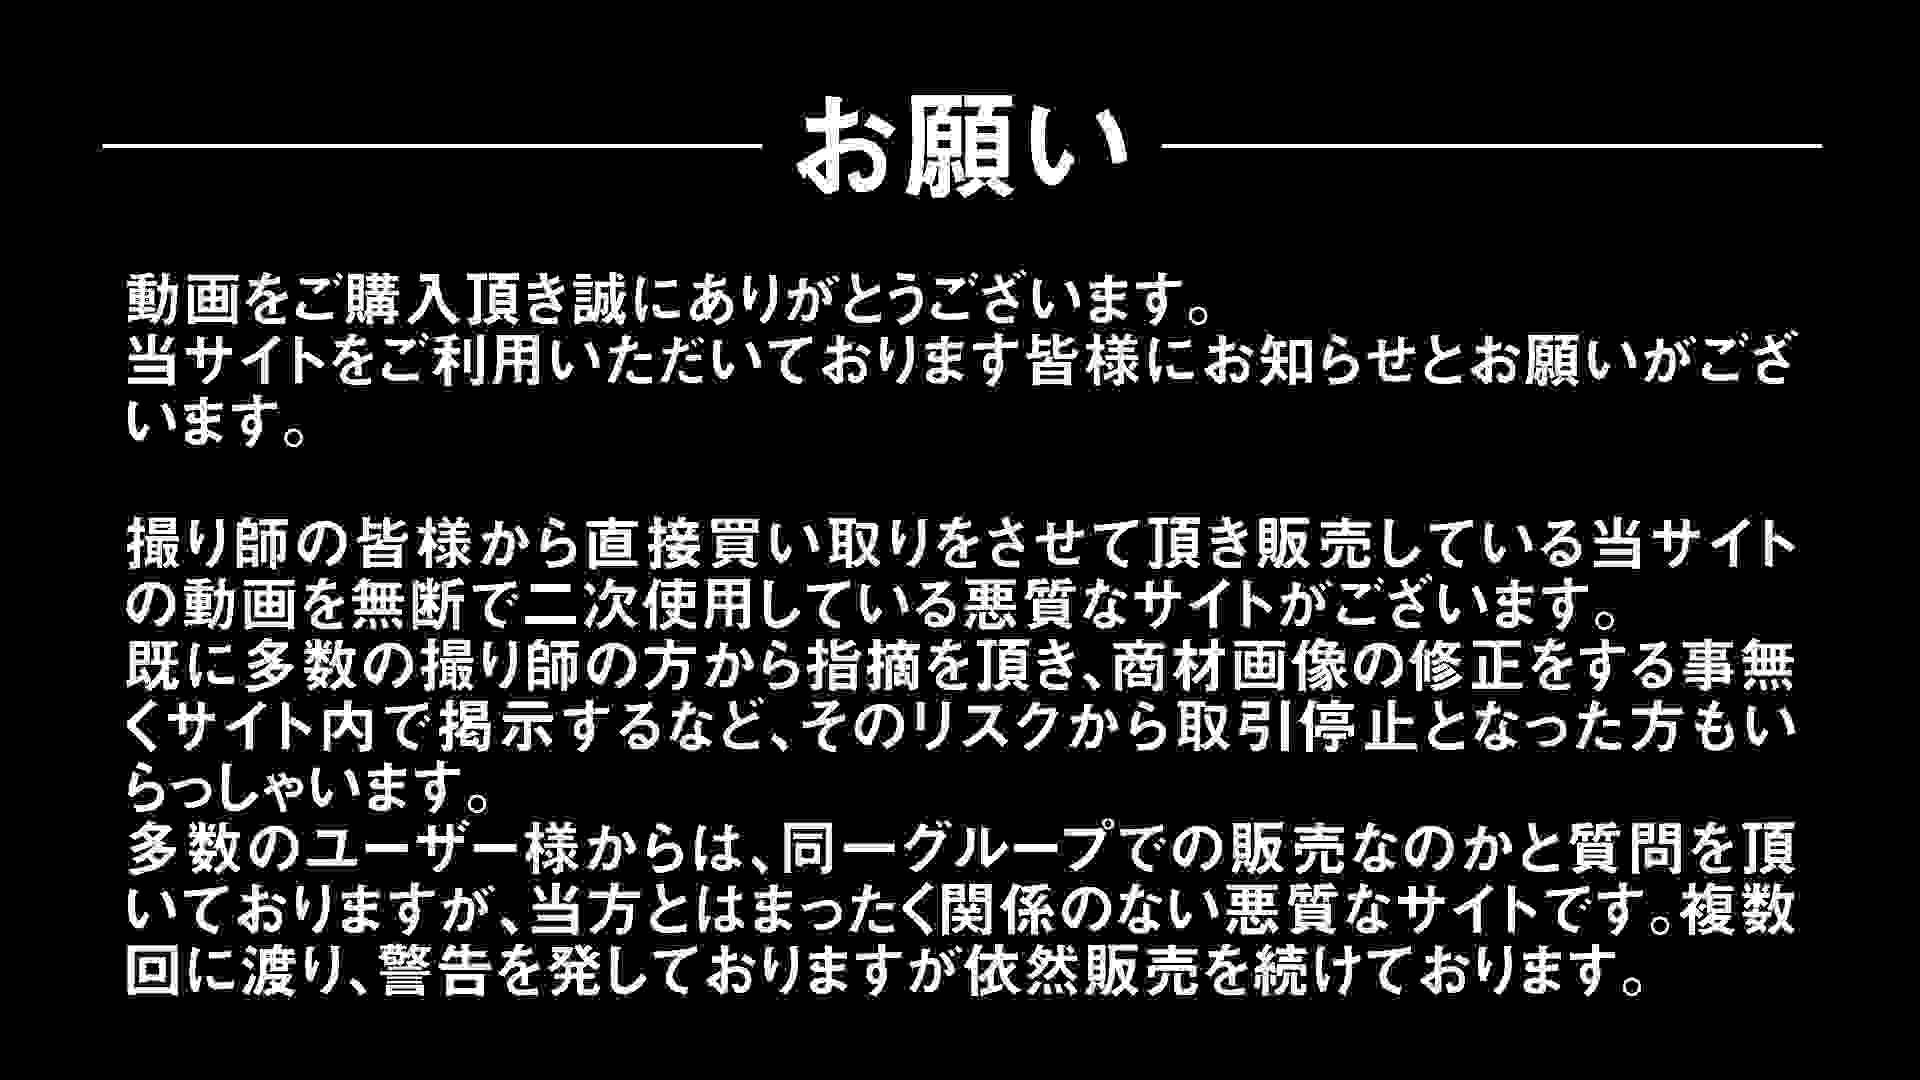 Aquaな露天風呂Vol.296 盗撮シリーズ   露天風呂編  102PIX 27